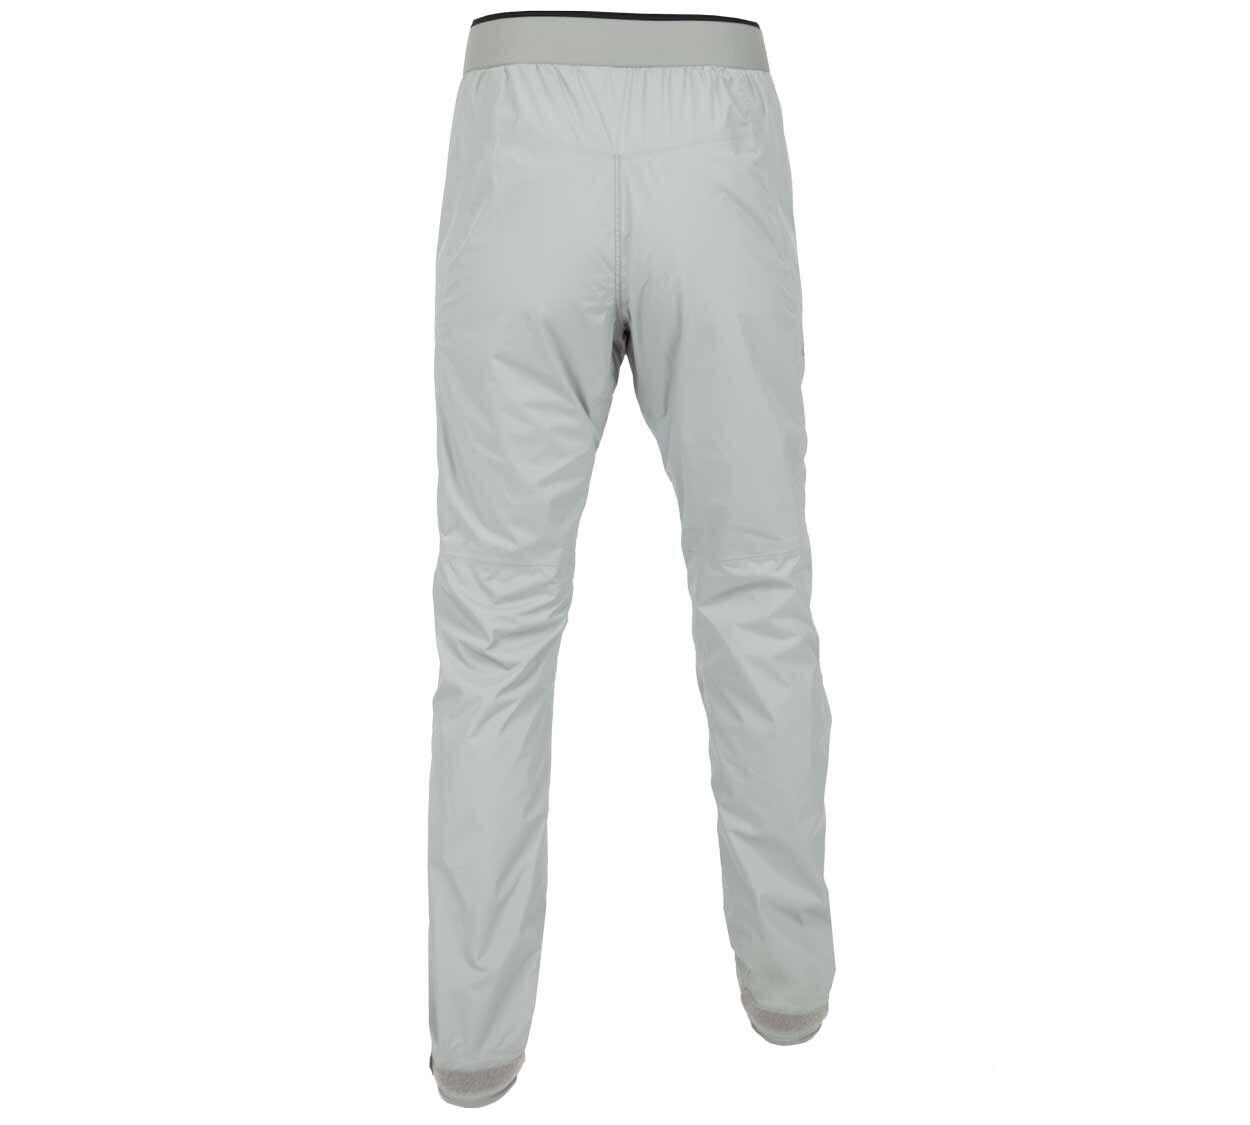 Kokatat Stance Pants - Men's / Back View